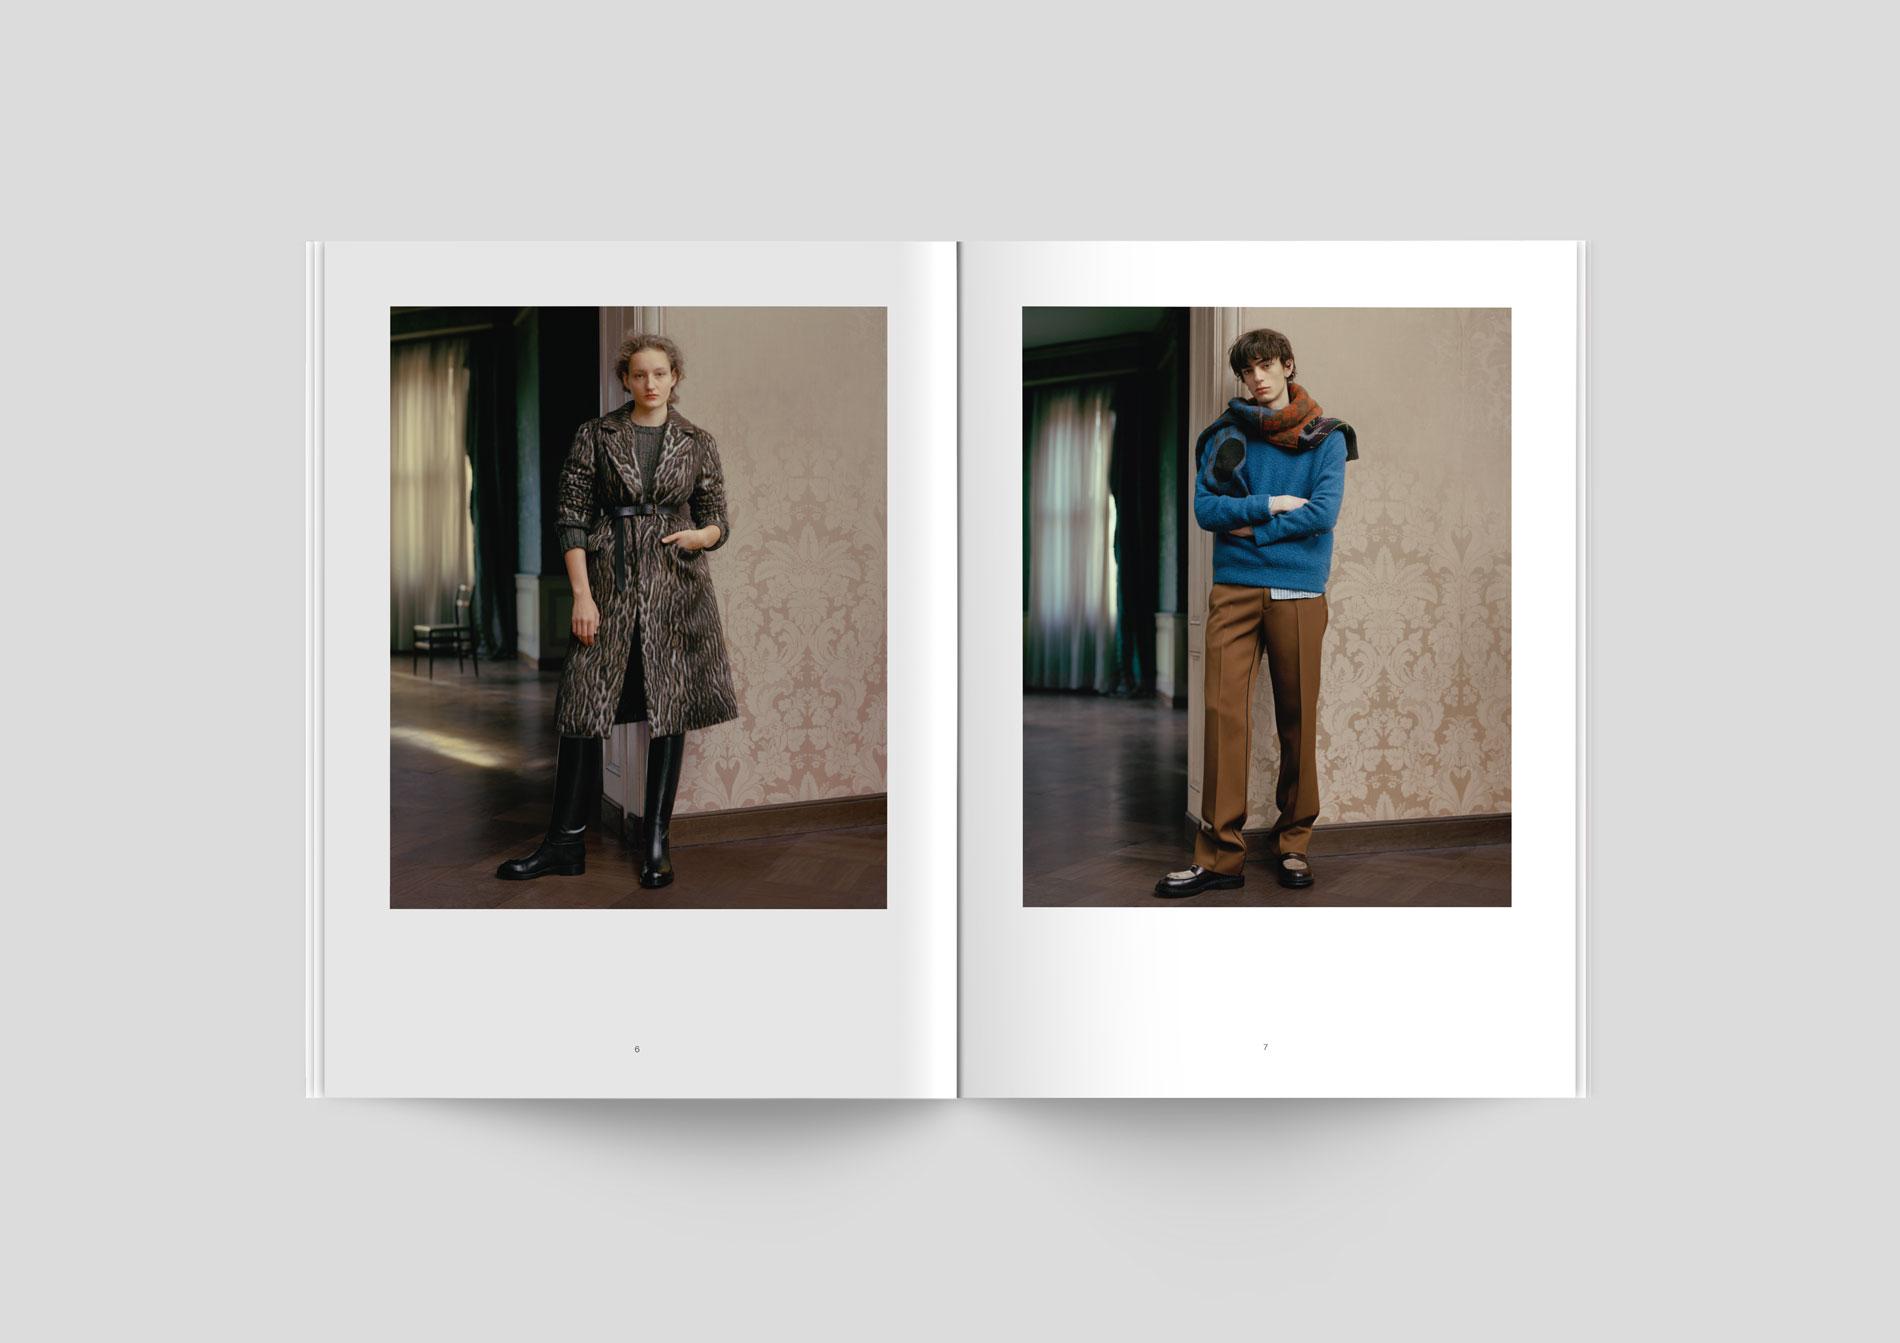 Santoni-Edited-by-Marco-Zanini-Tom-Ordoyno 01